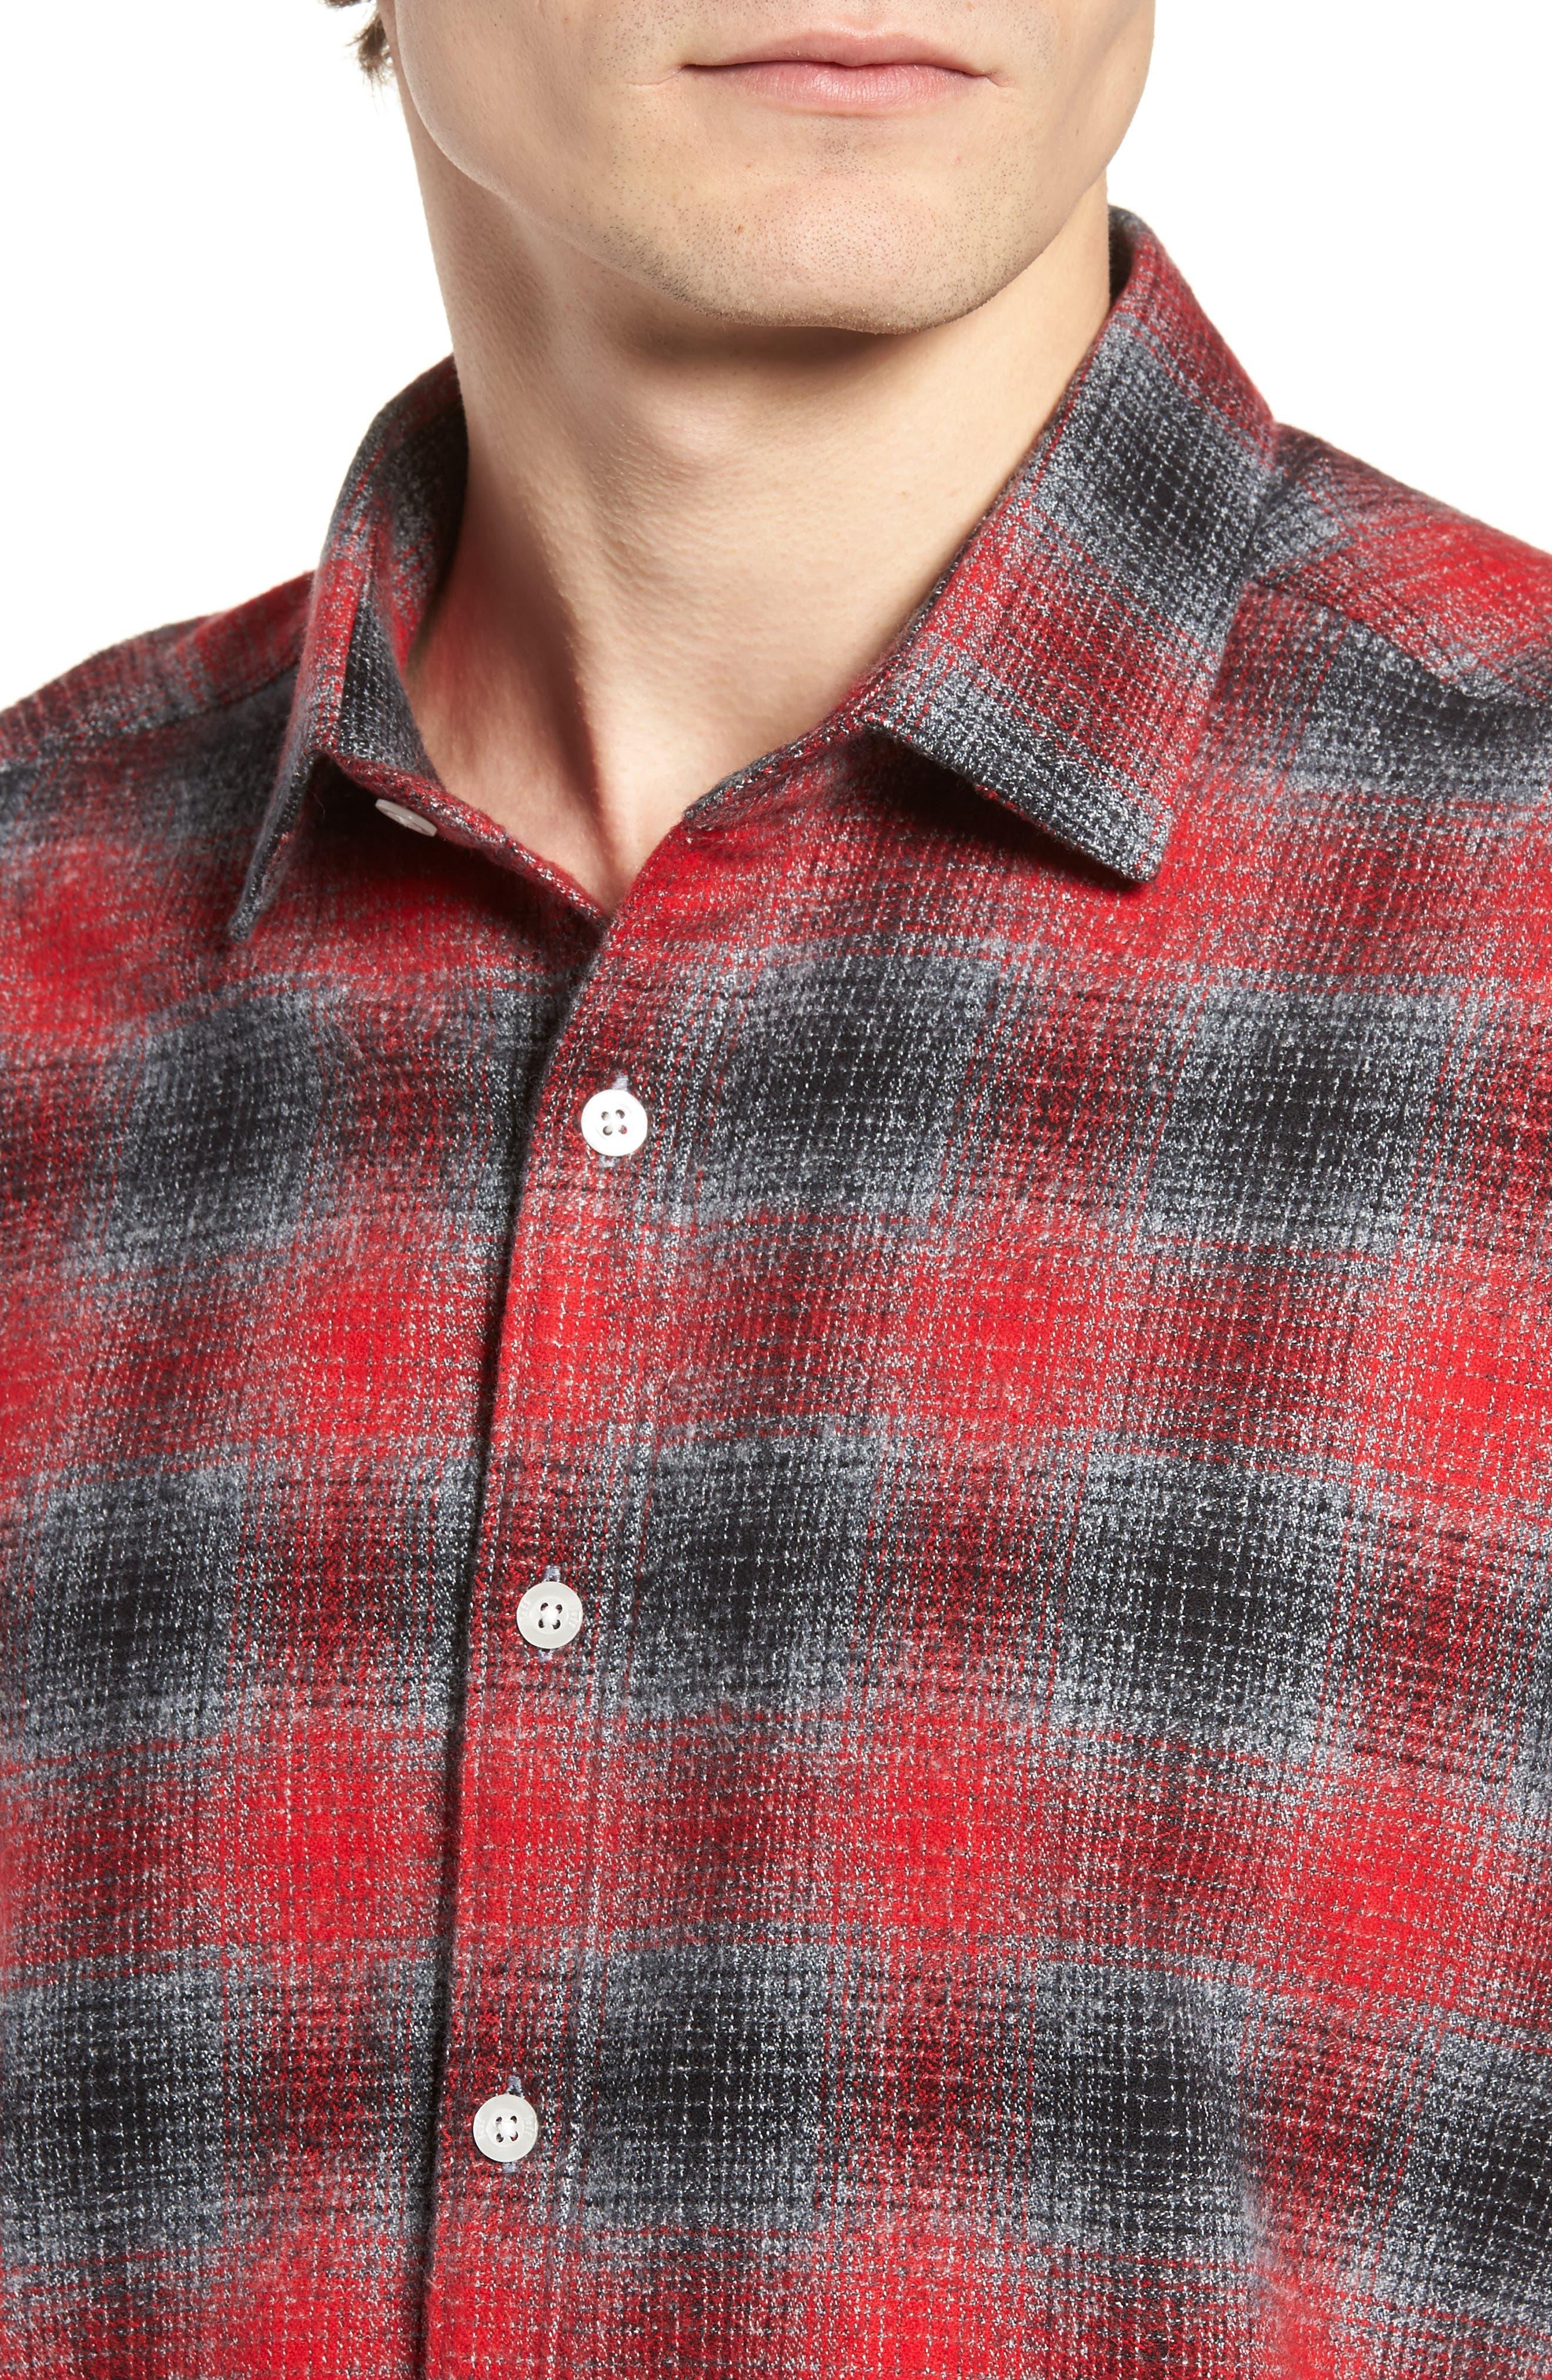 Stowe Slim Fit Plaid Sport Shirt,                             Alternate thumbnail 4, color,                             021